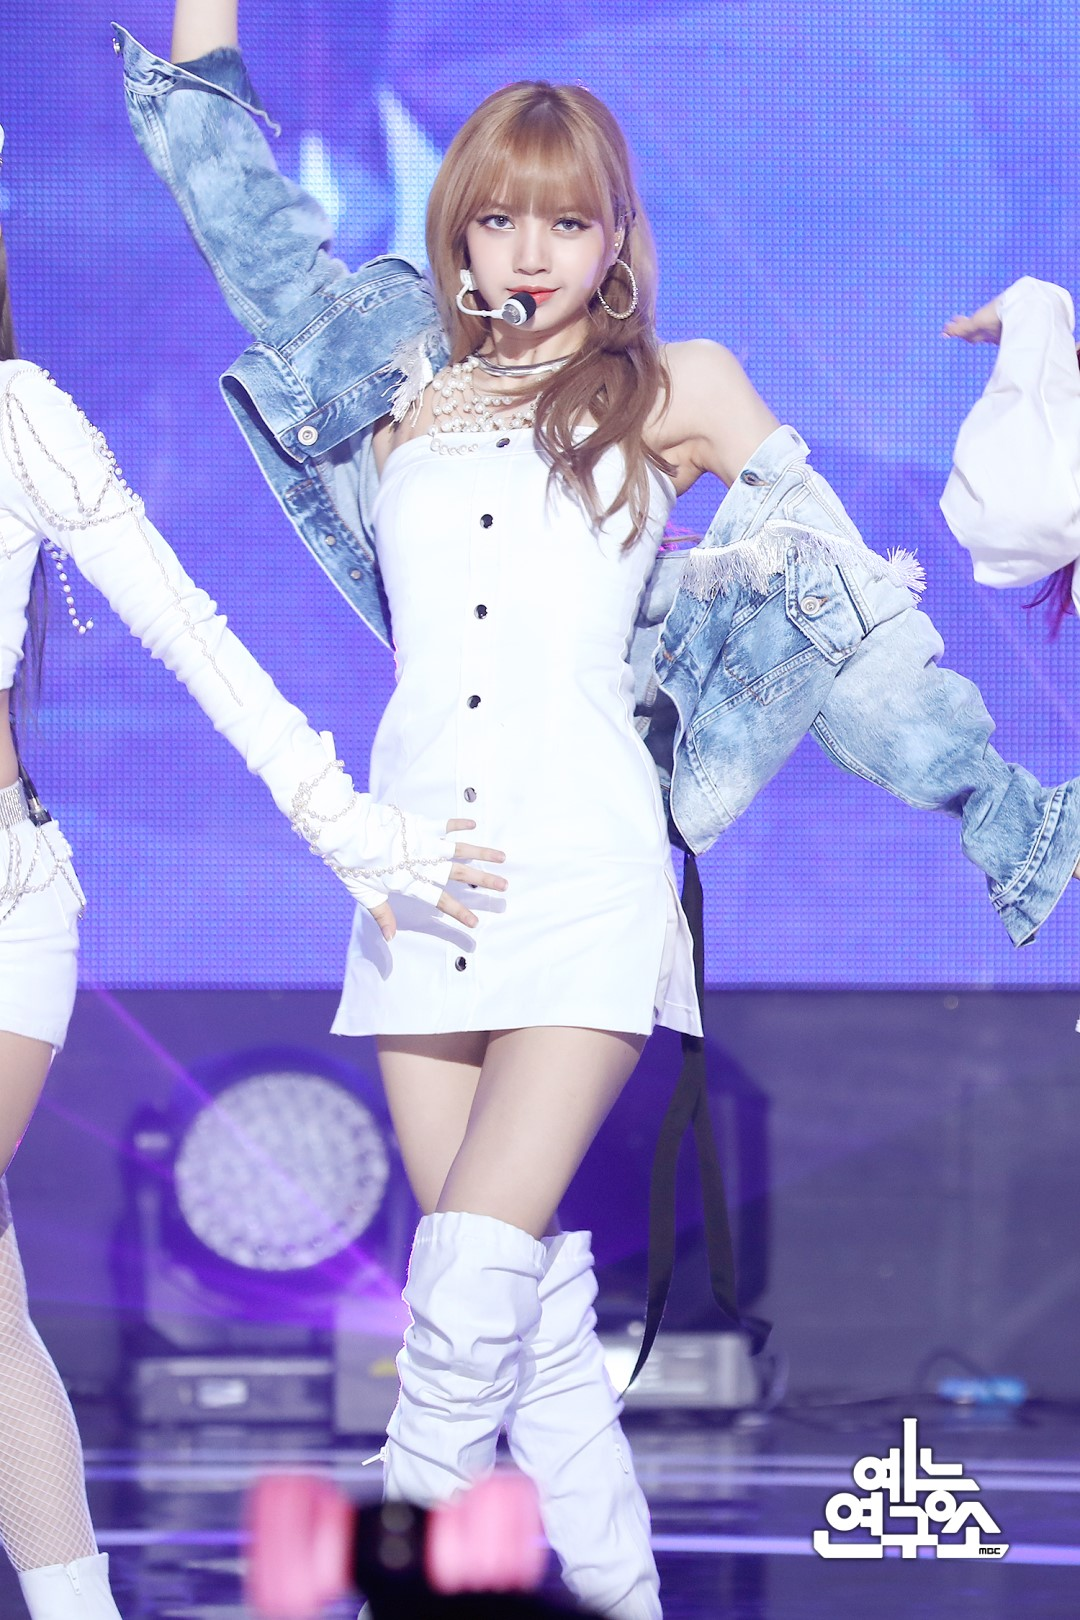 BLACKPINK-Lisa-MBC-Music-Core-white-outfit-30-June-2018-photo-2